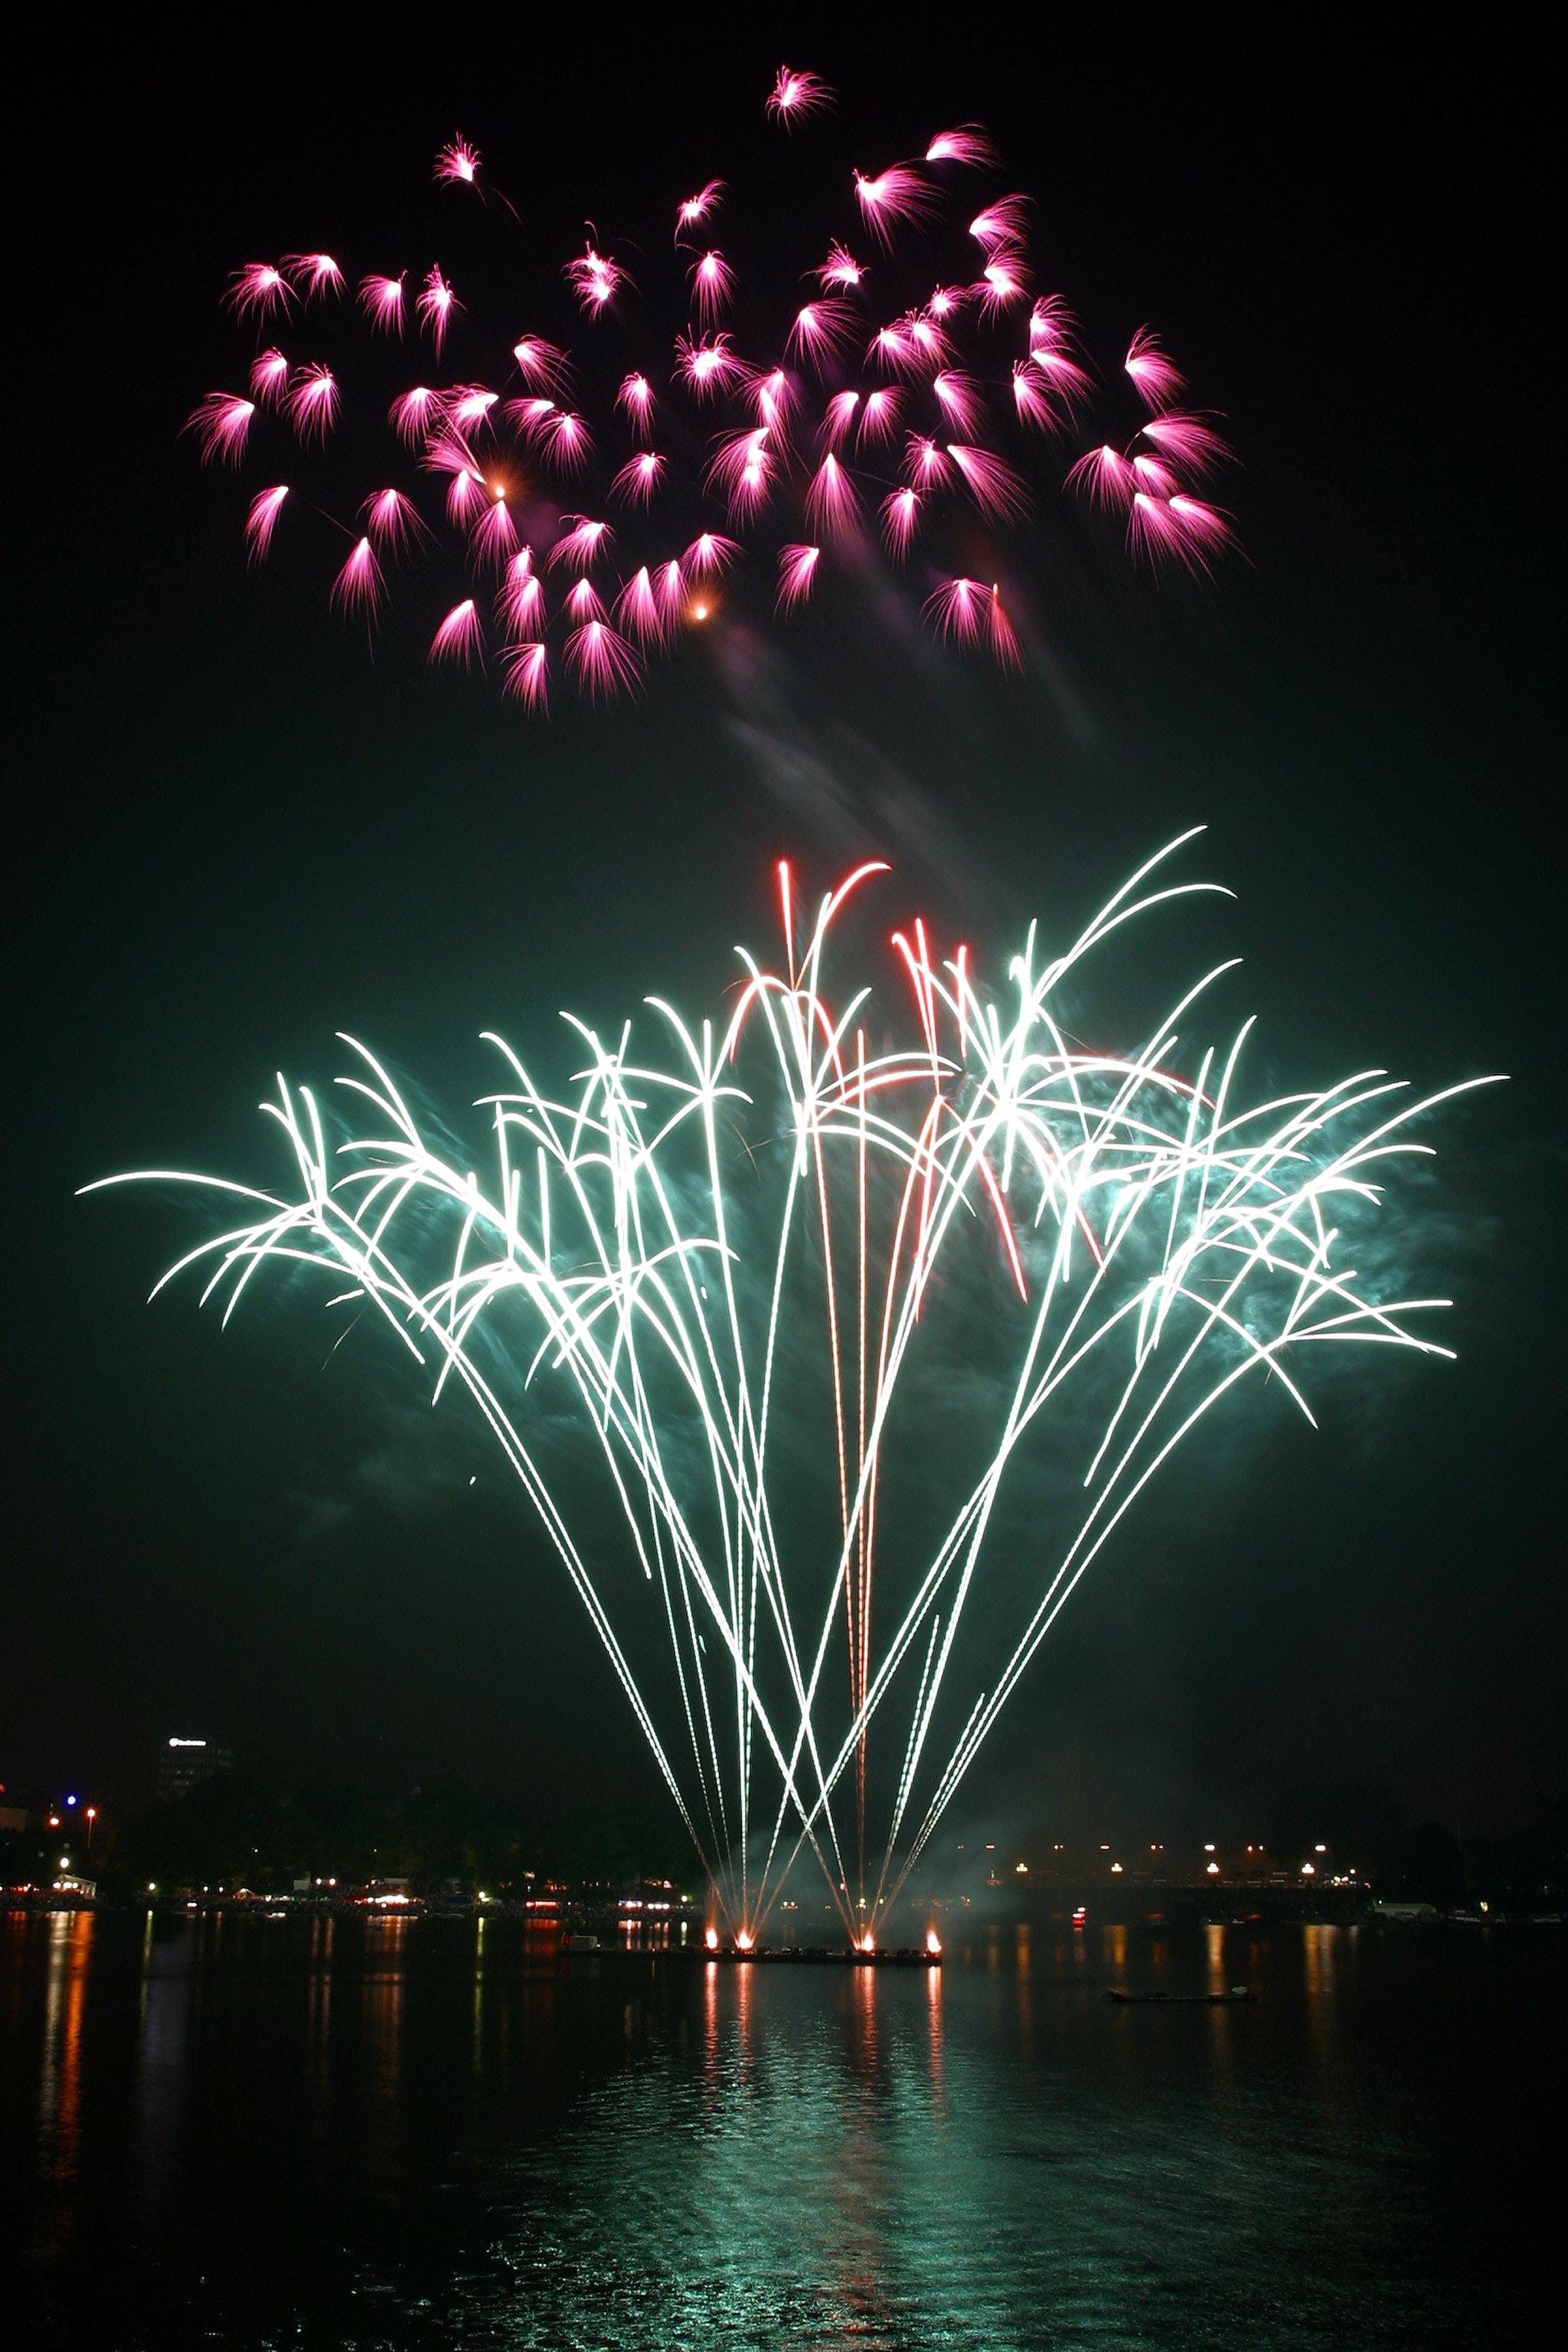 Fireworks Display during Nighttime, 2018, Light, Sparks, Sparkler, HQ Photo